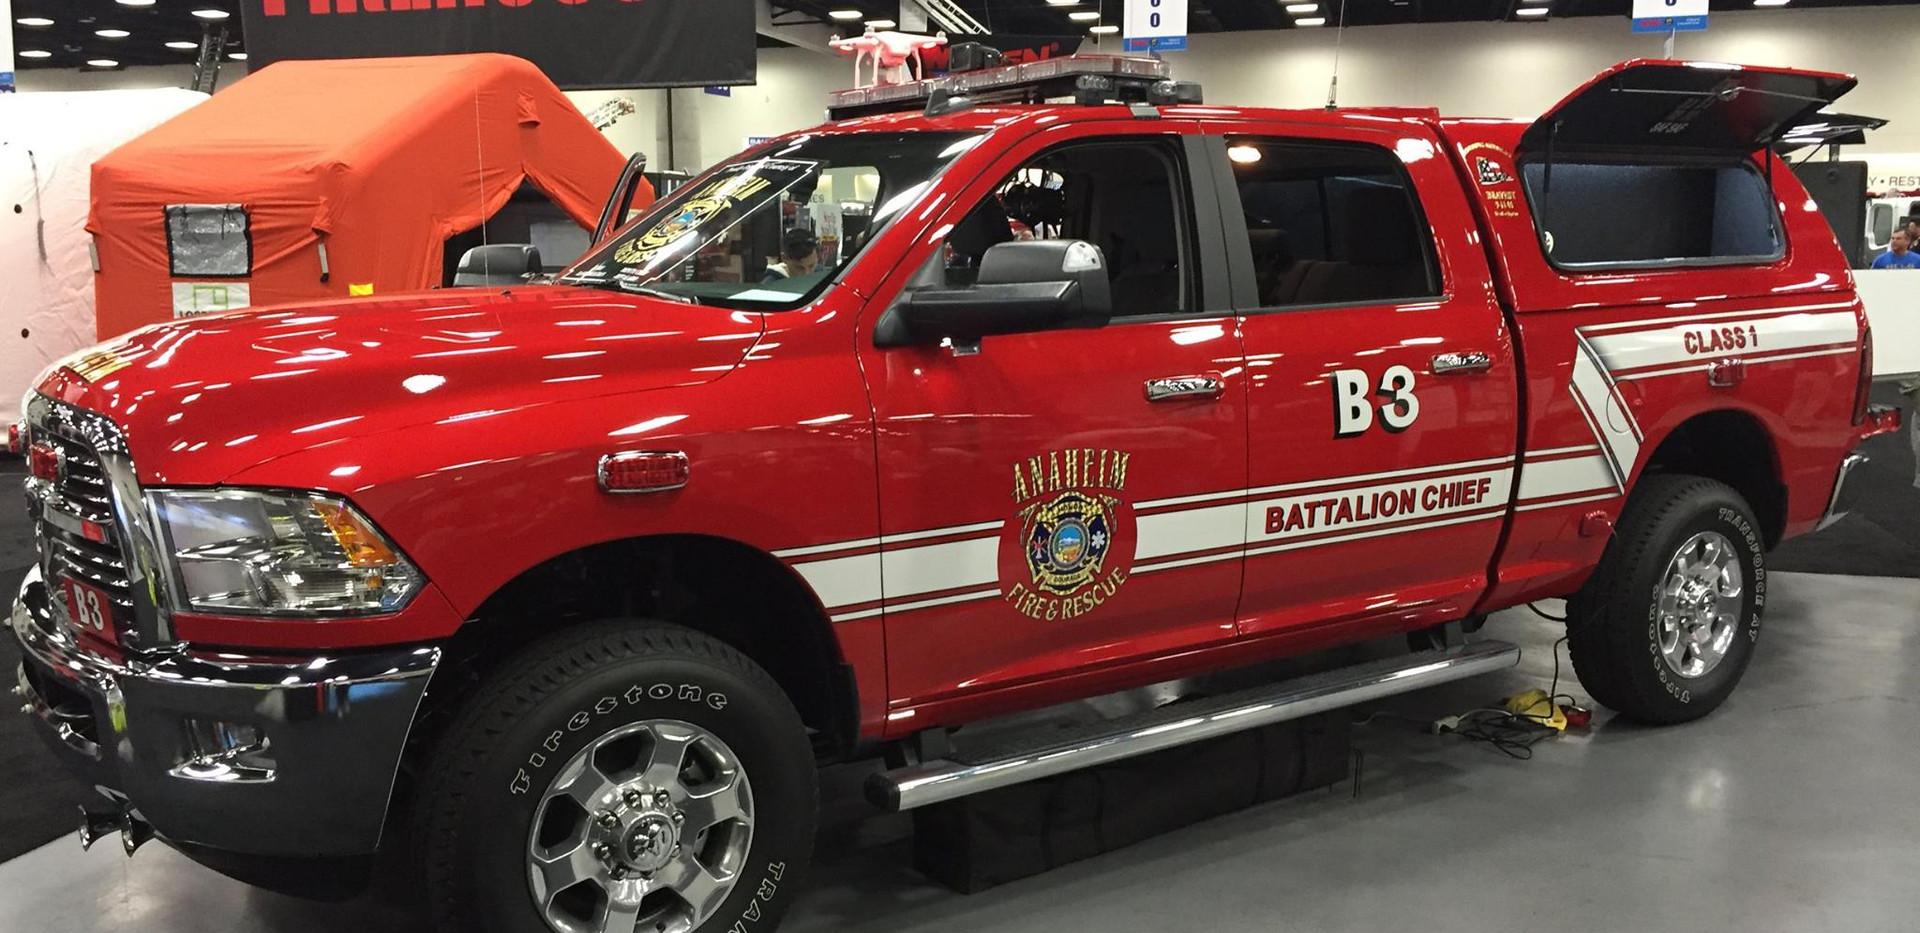 Anaheim Fire showfloor.jpg